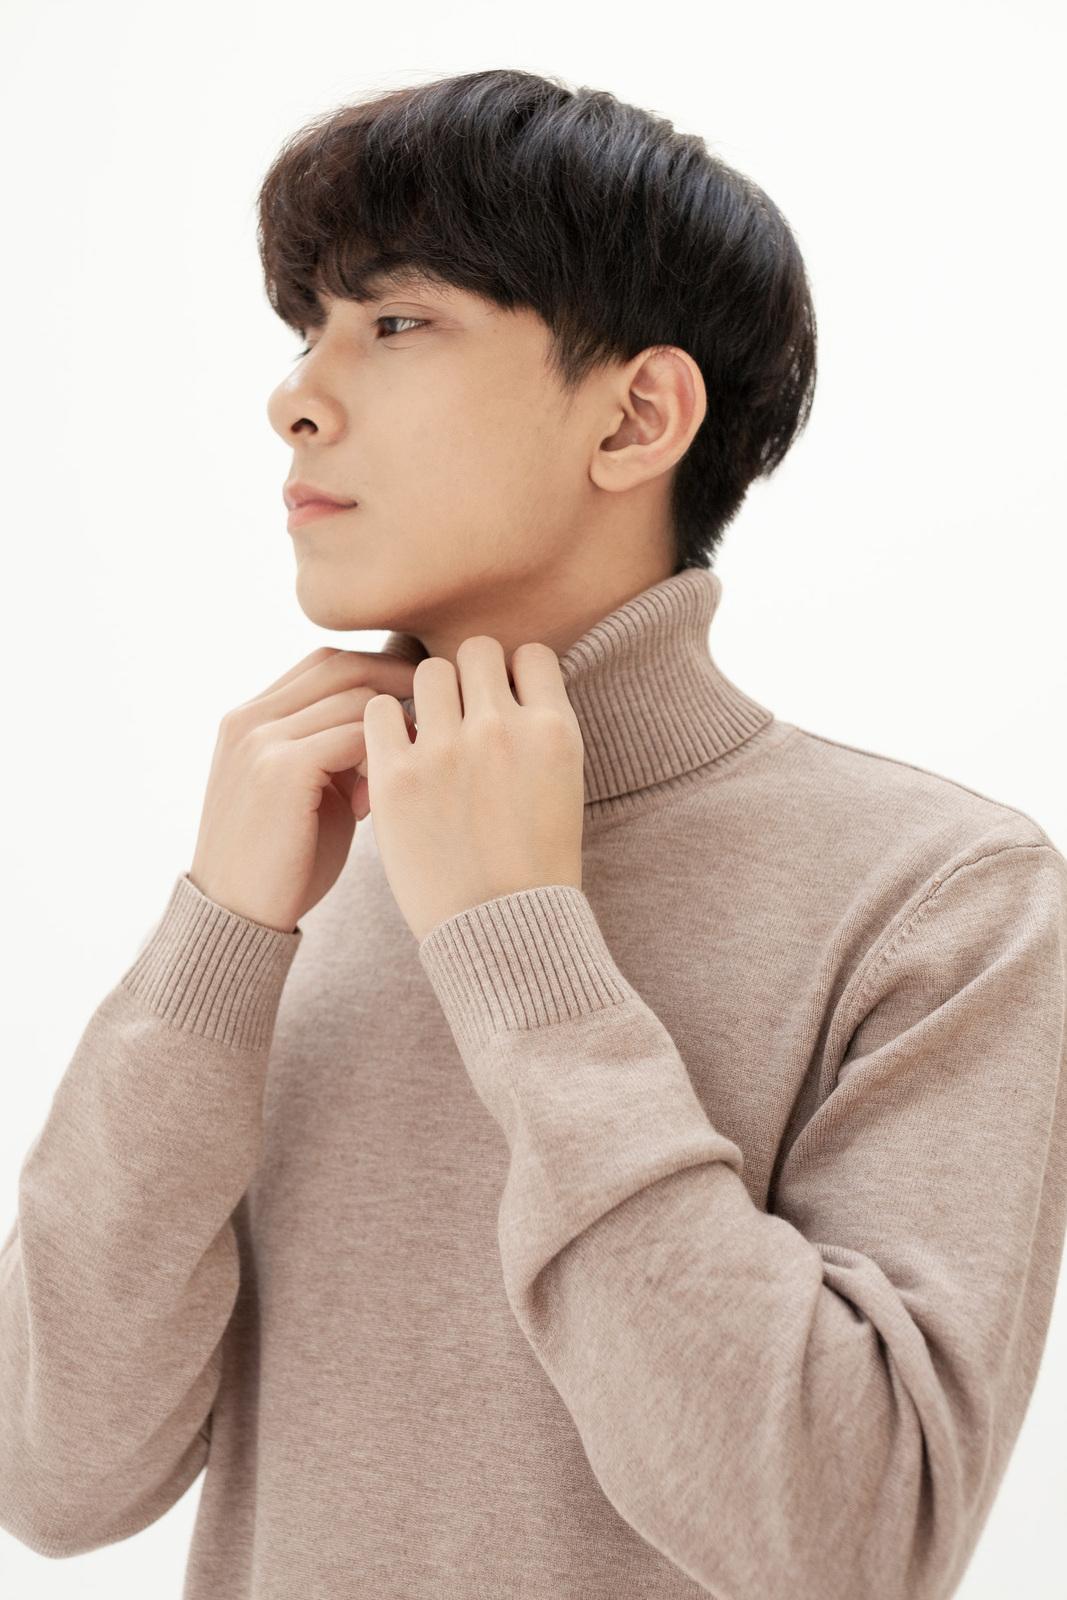 Look Turtle neck sweater